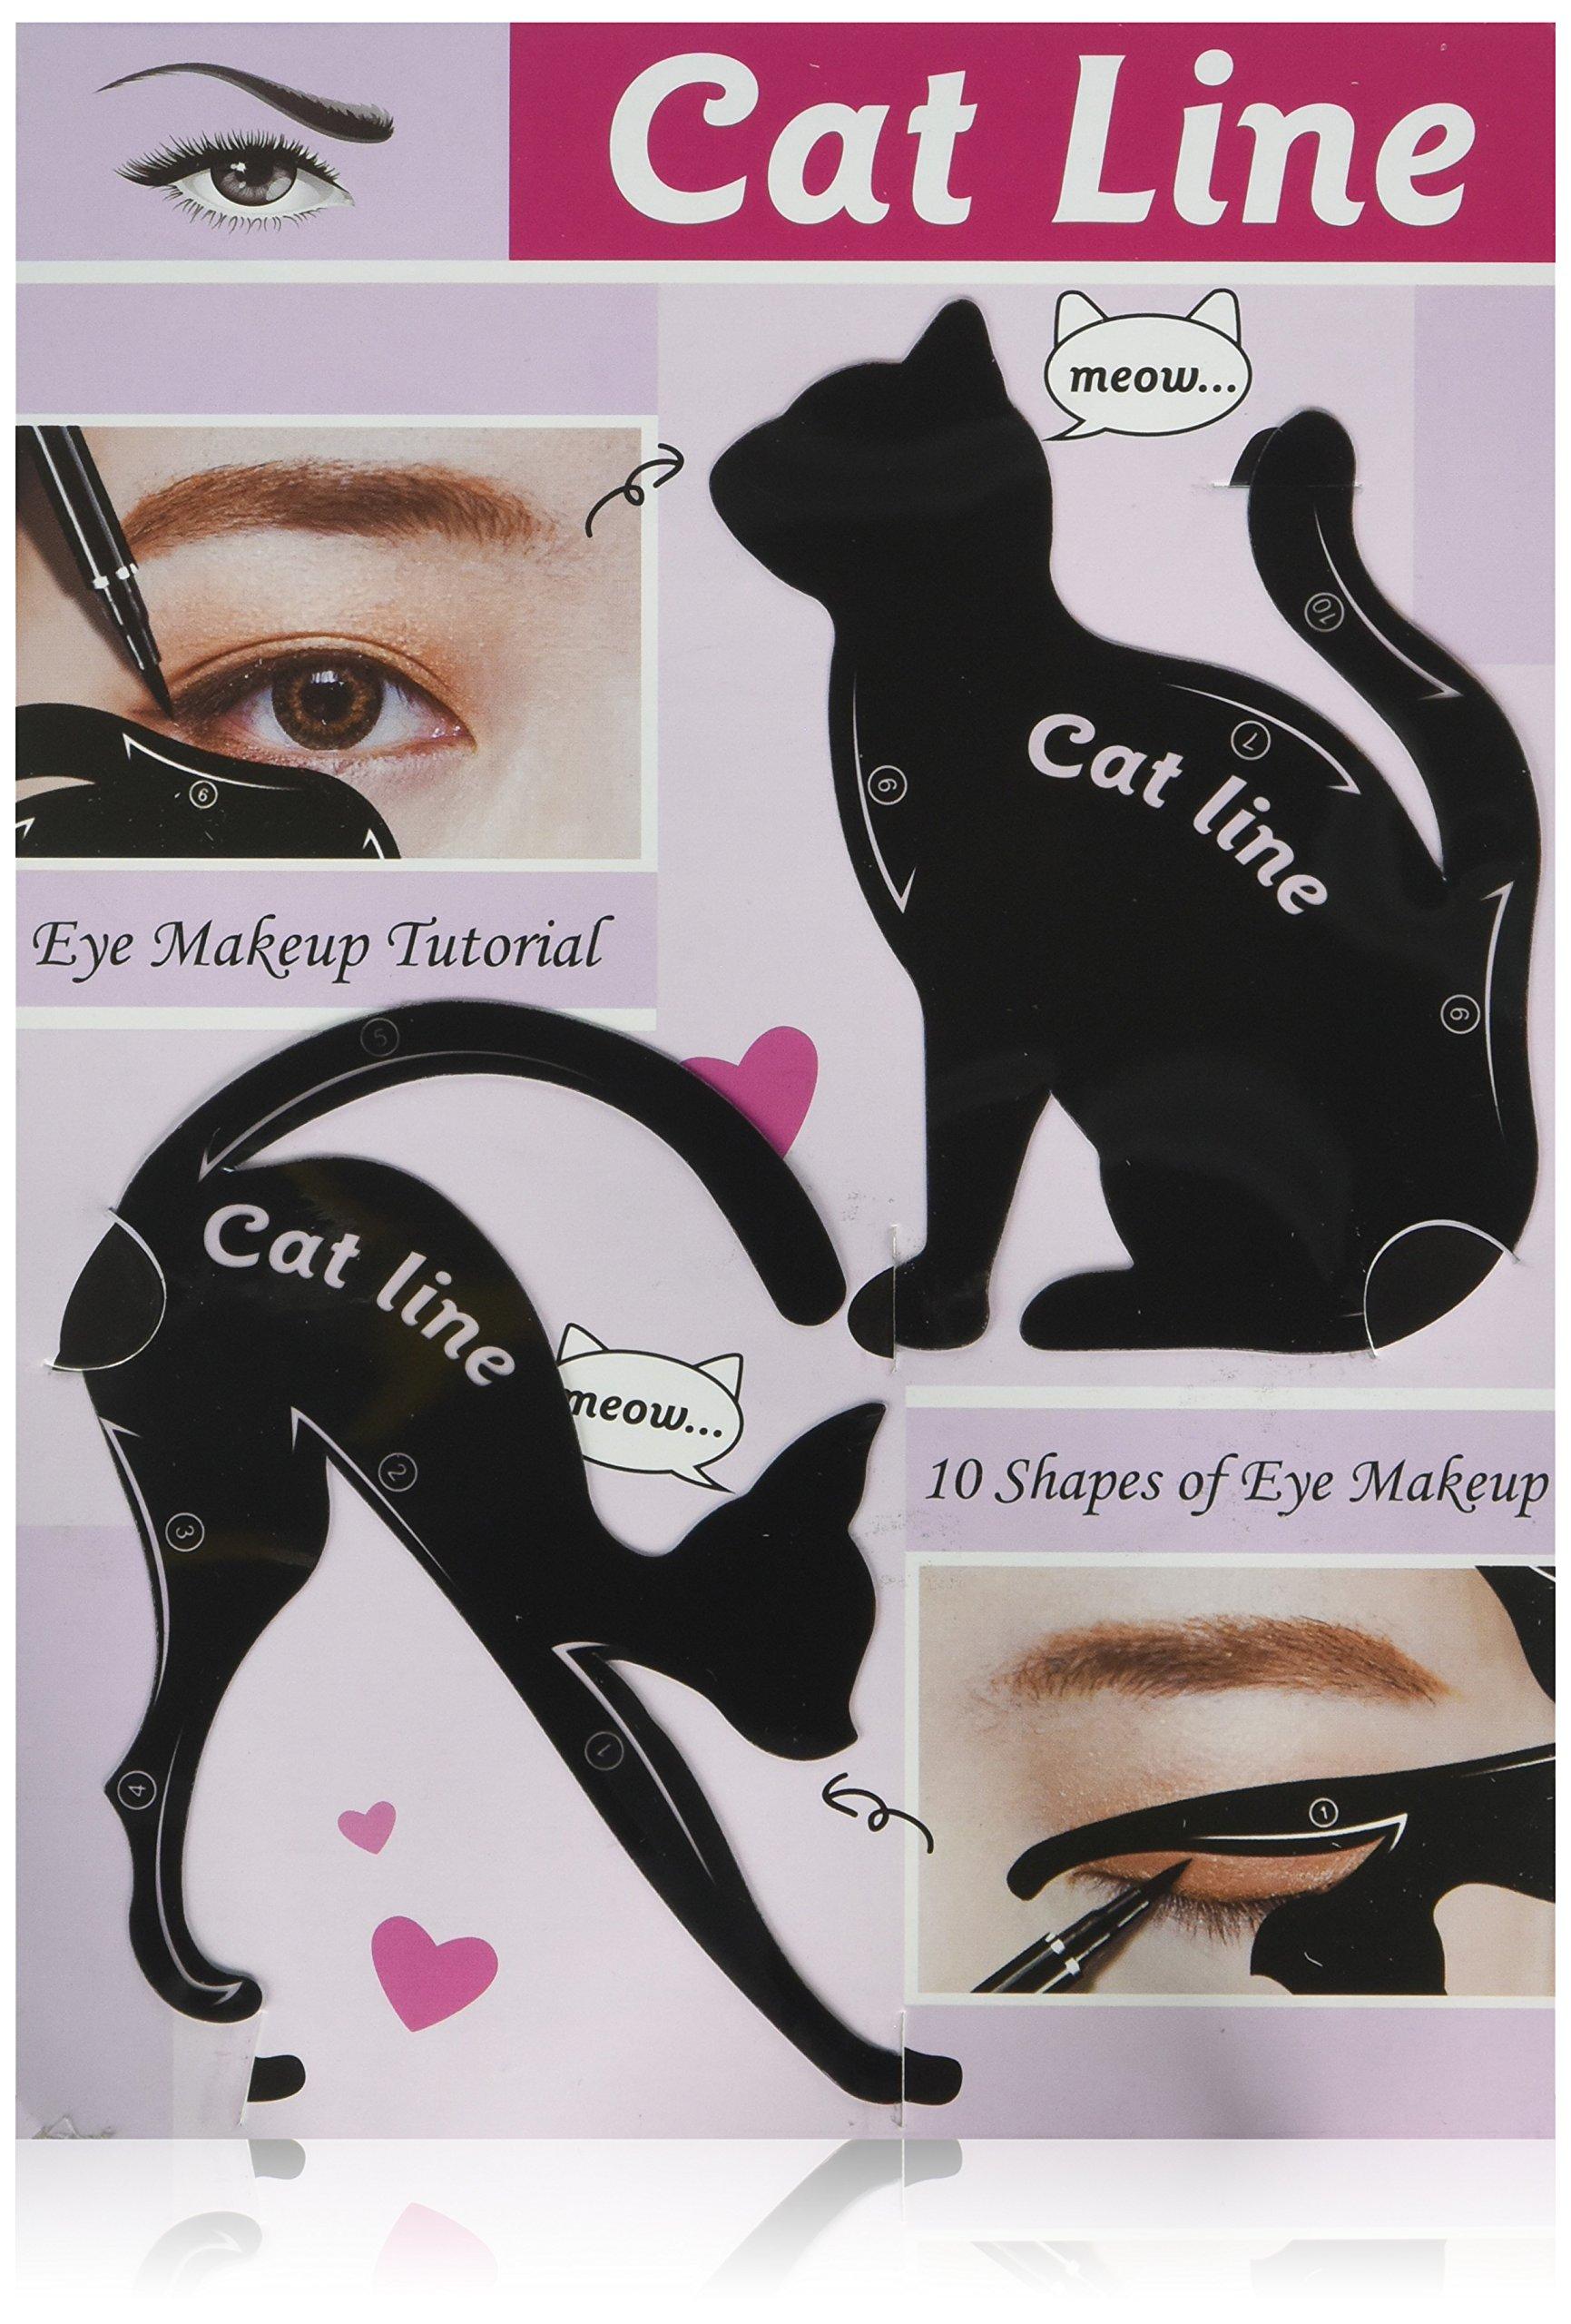 LKE 2 in 1 Cat Eyeliner Stencil,Matte PVC Material Smoky Eyeshadow Applicators Template Plate,Professional Multifunction Black Cat Shape Eye liner & Eye Shadow Guide Template (1 PACK)